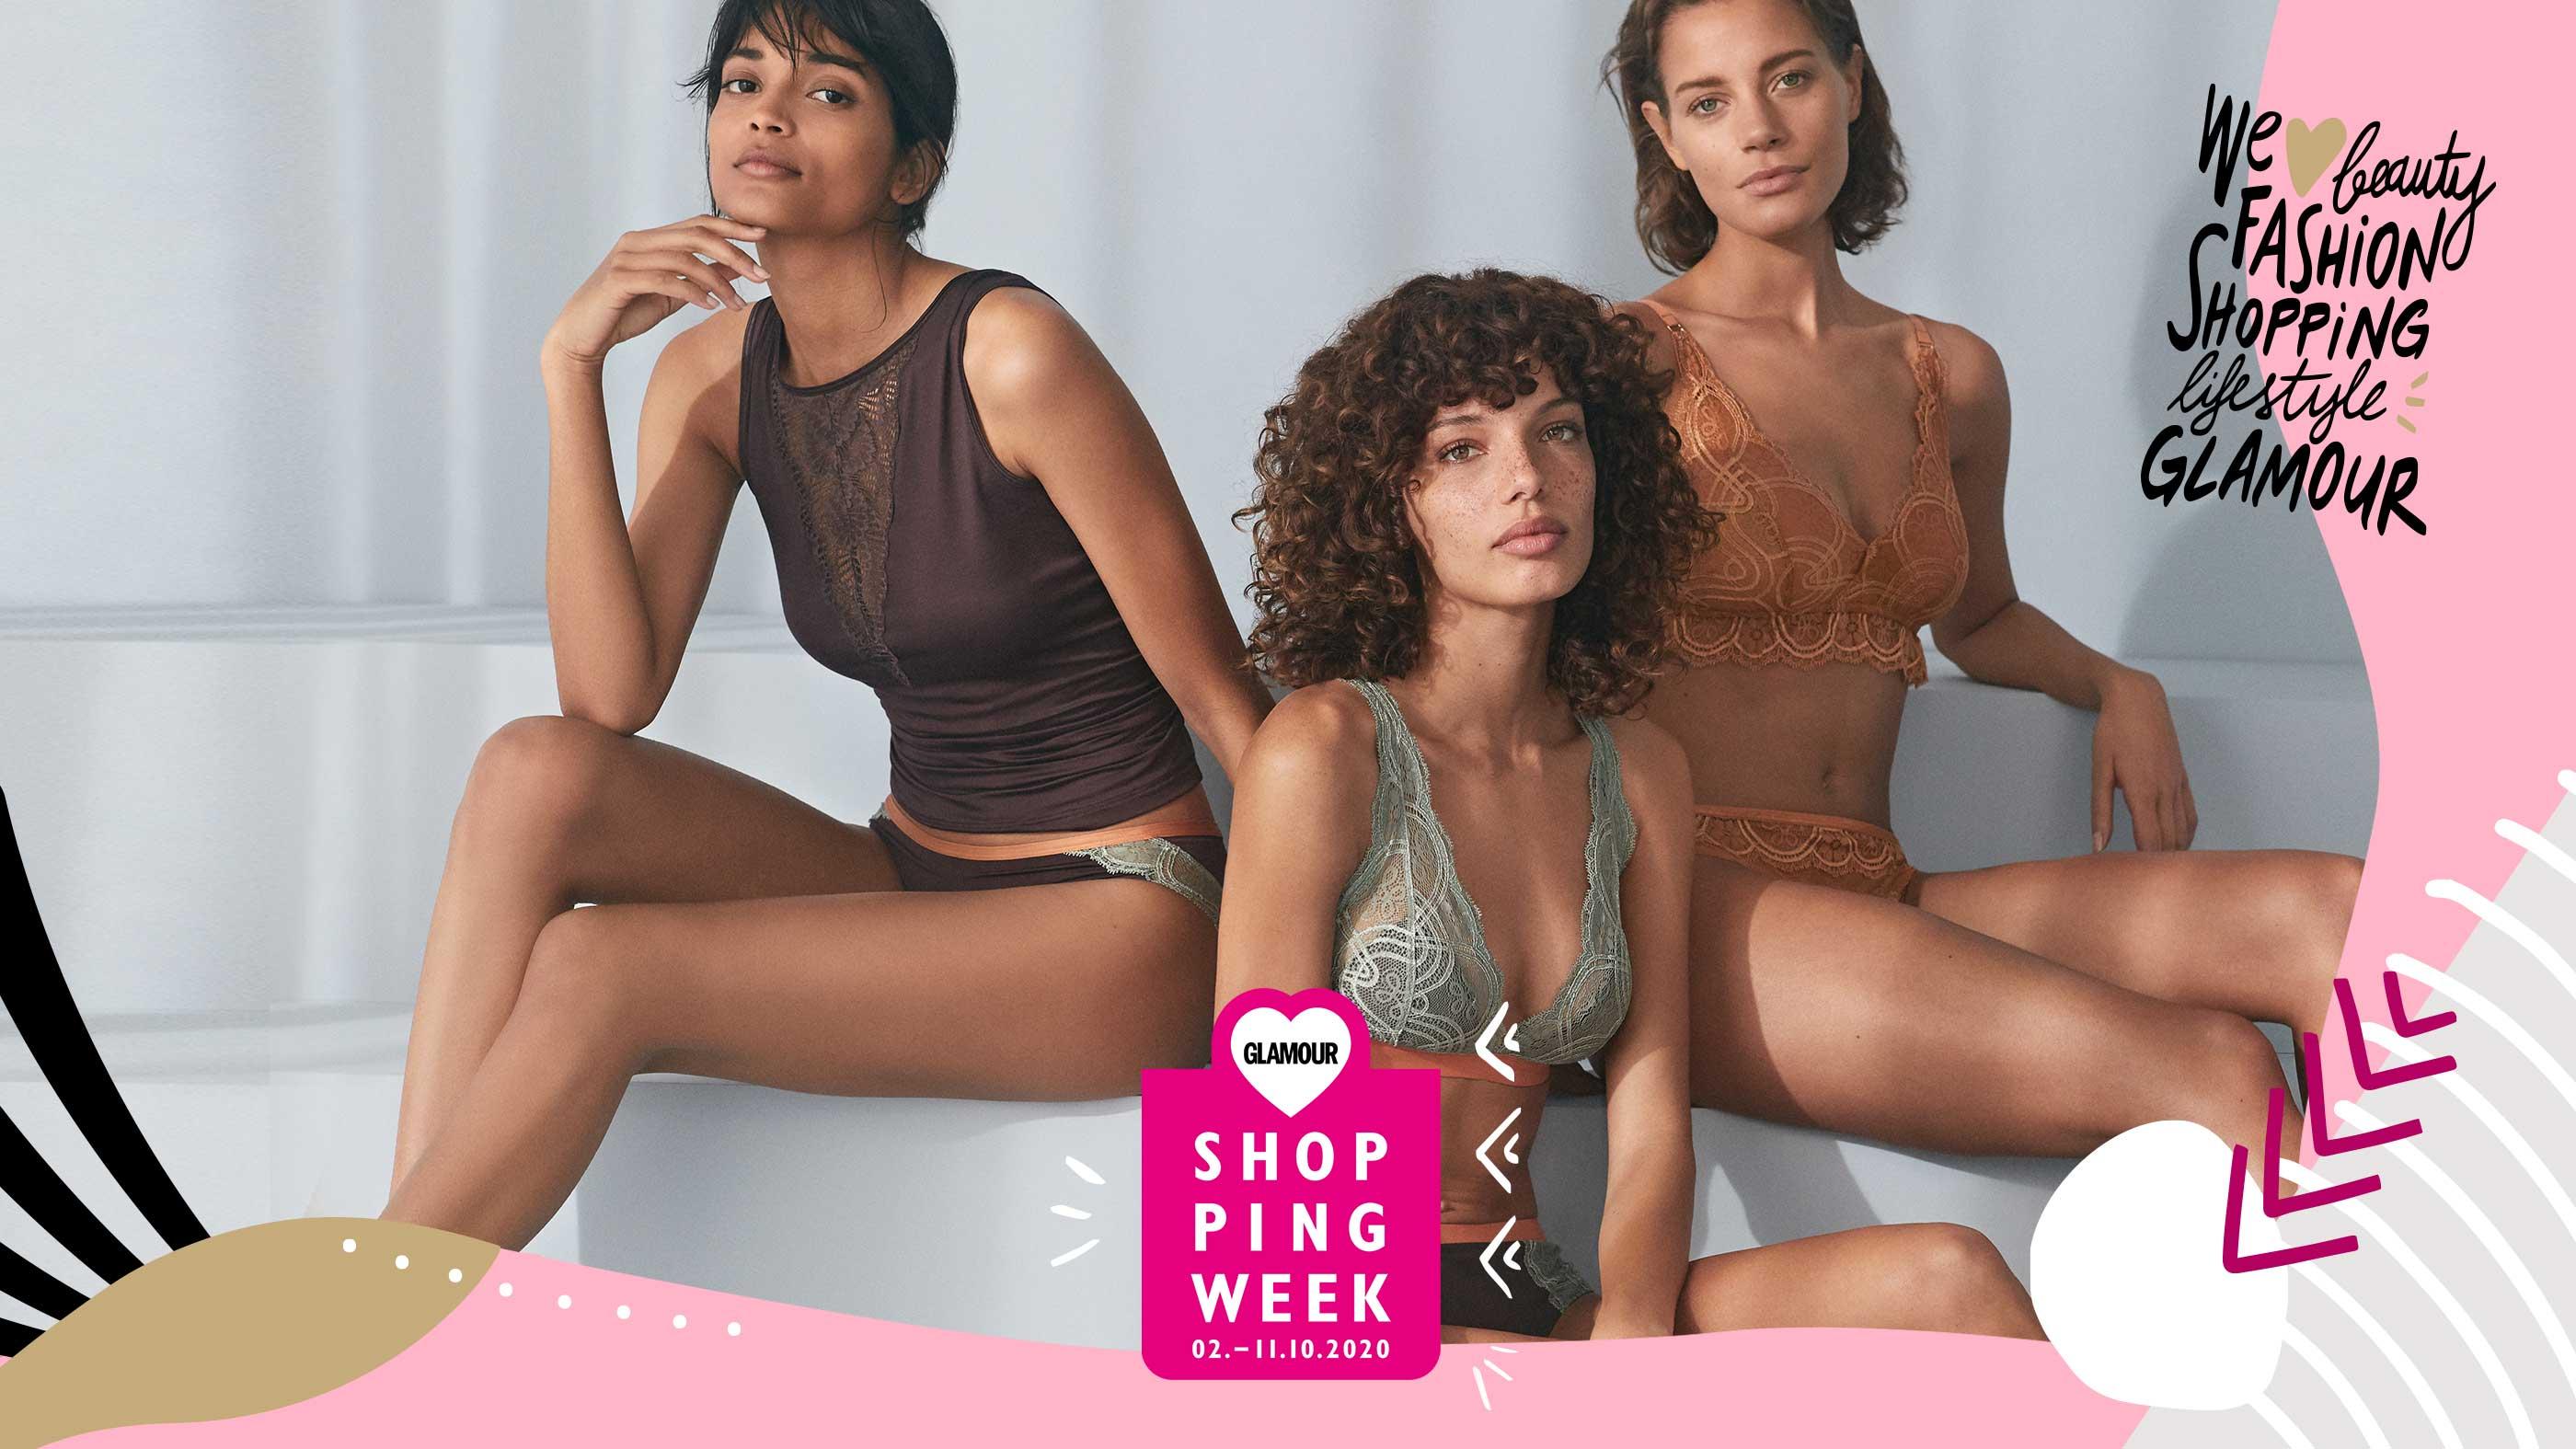 Mey nimmt an der GLAMOUR Shopping Week 2020 teil